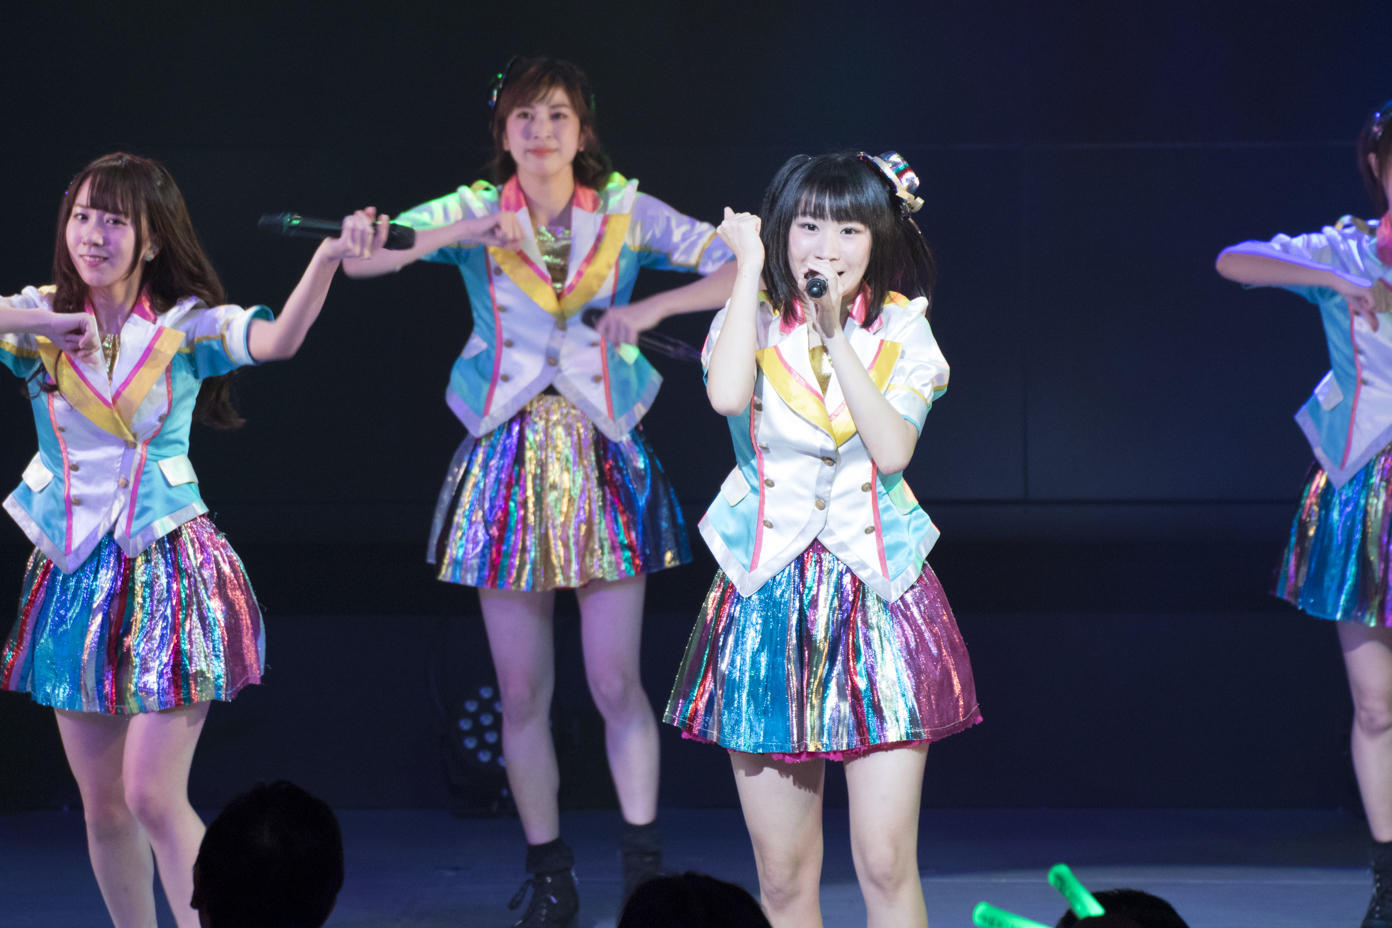 http://news.yoshimoto.co.jp/20161228125722-2adfb52fdf1c2ba1f70825af8717212818b0013b.jpg